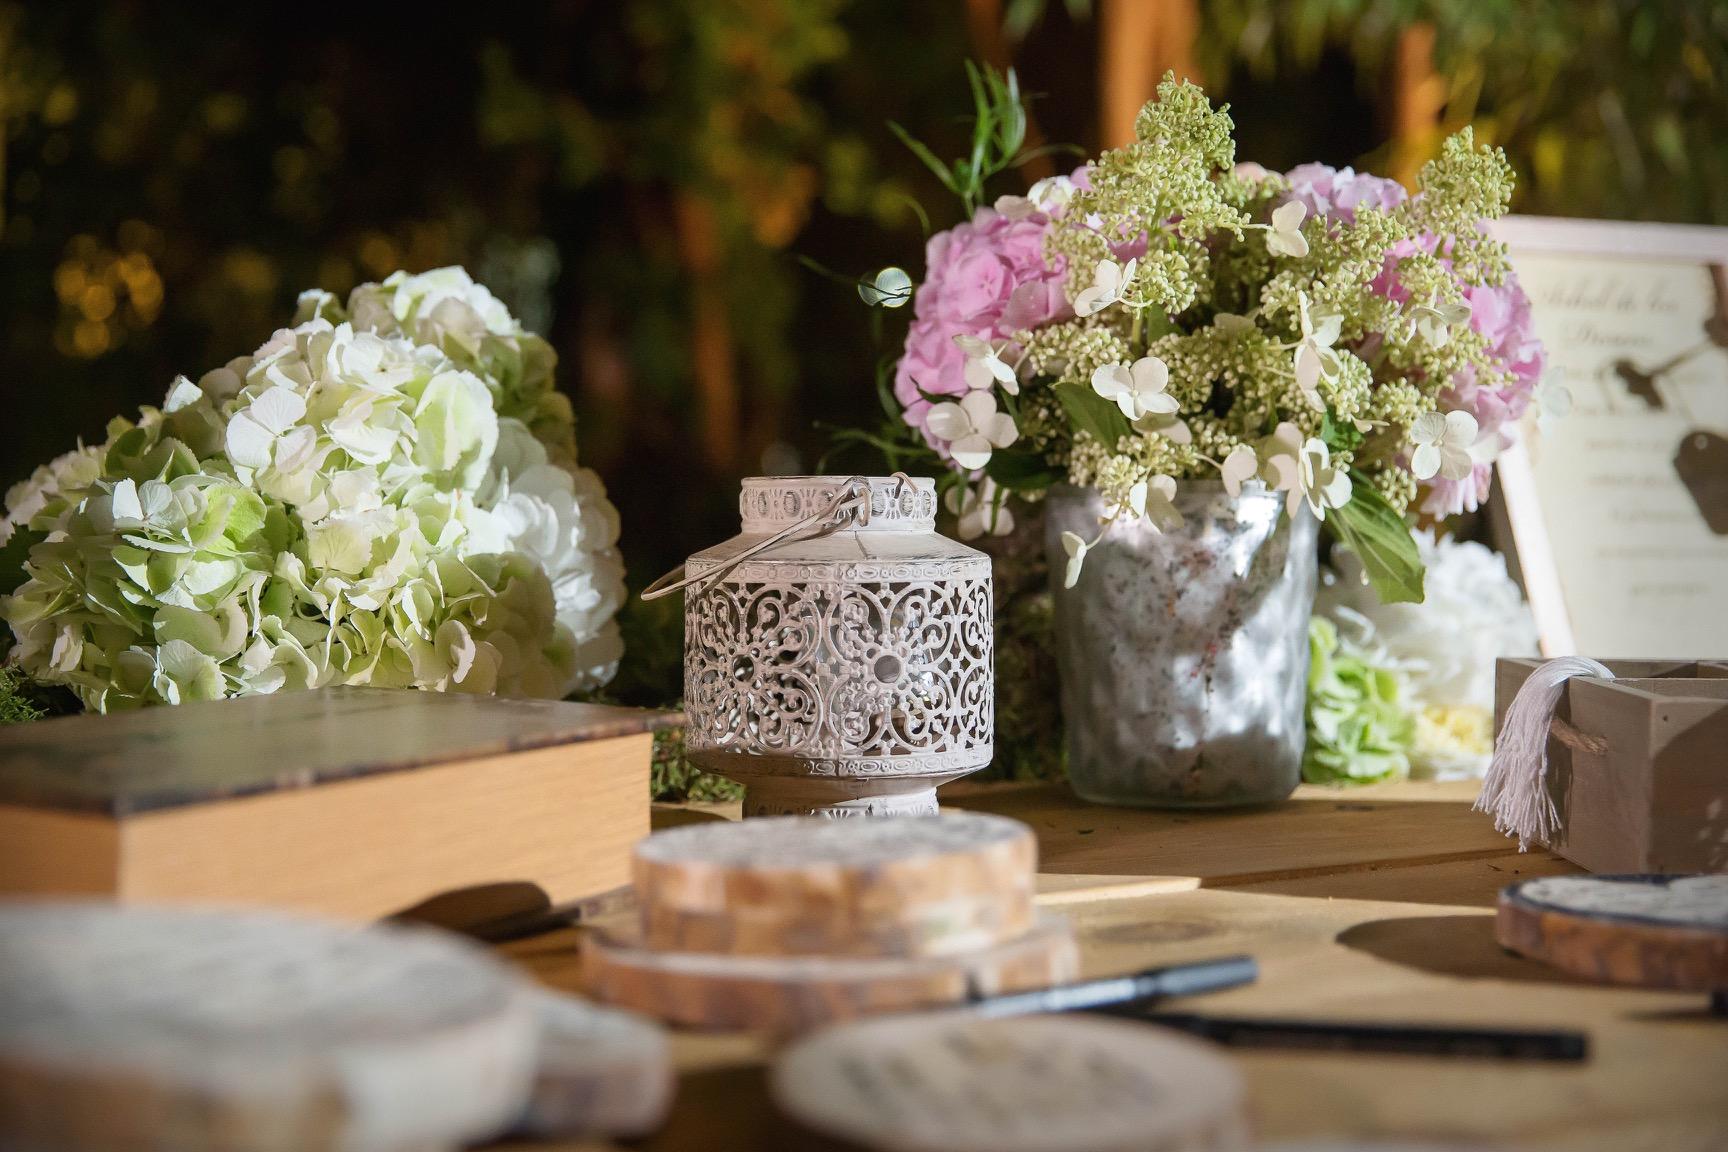 Si-Quiero-Wedding-Planner-By-Sira-Antequera-Bodas-Málaga-Marbella-Miami Natalia-Jaime-11